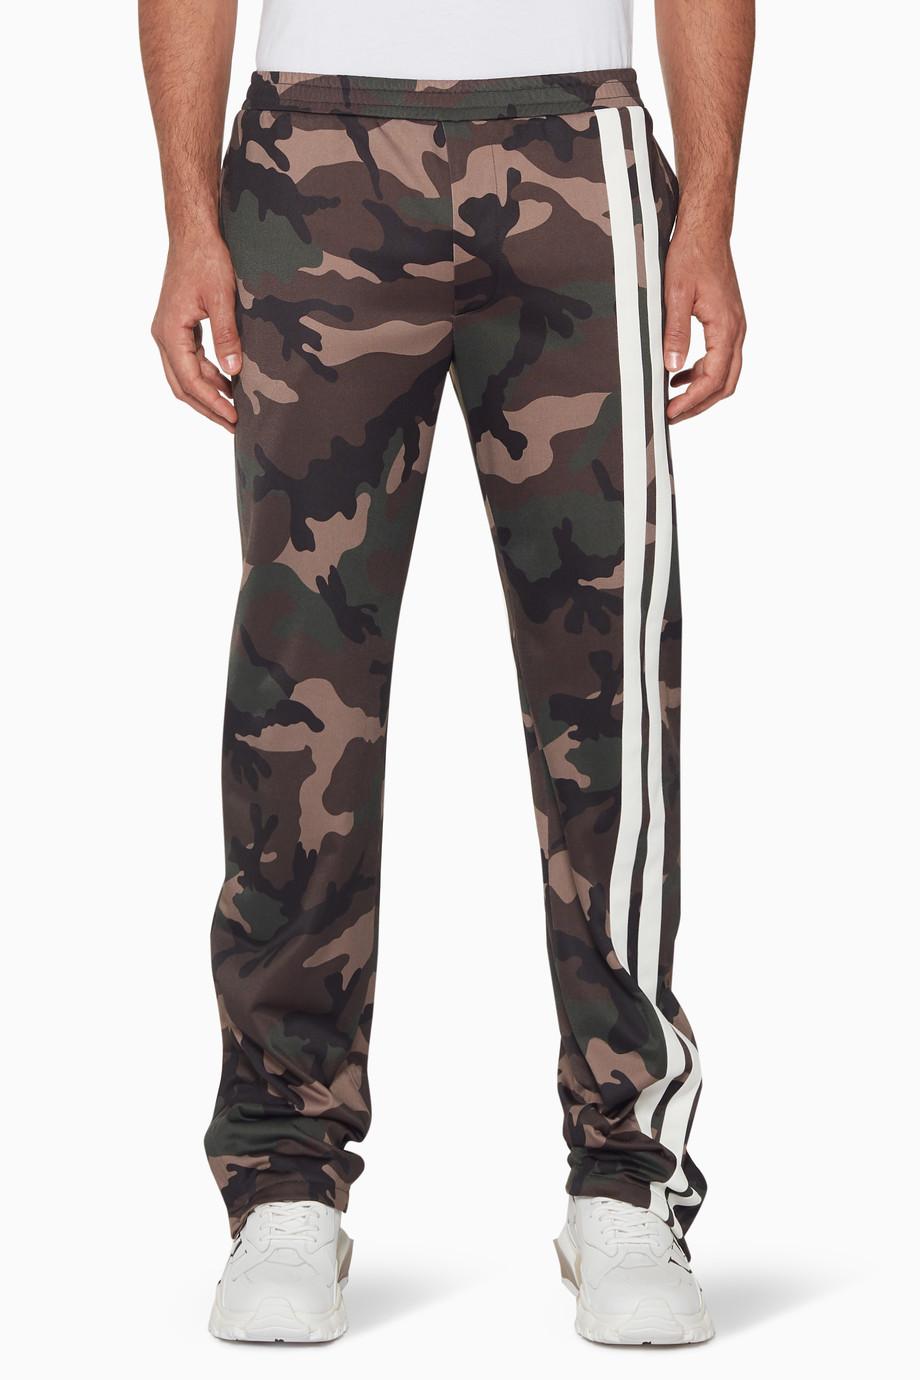 2bb8ff8cbba27 Shop Valentino Green Dark-Green Camouflage Sweatpants for Men | Ounass